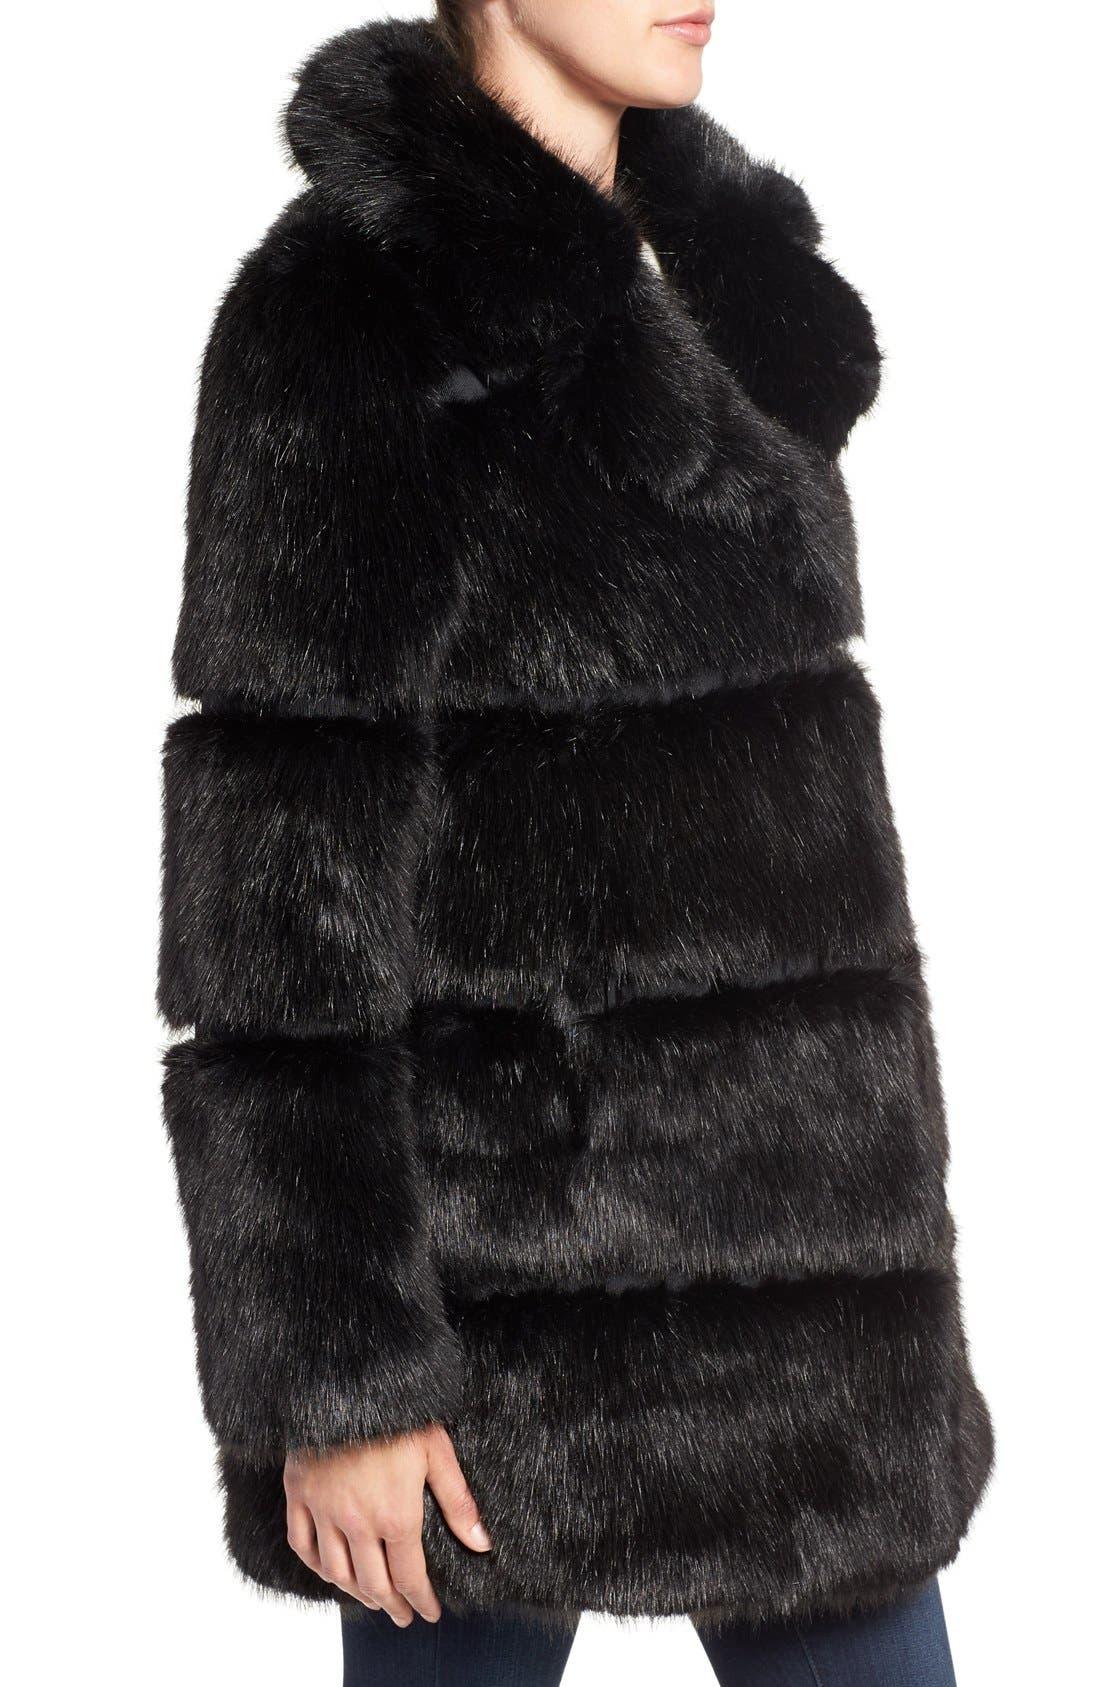 grooved faux fur coat,                             Alternate thumbnail 4, color,                             001